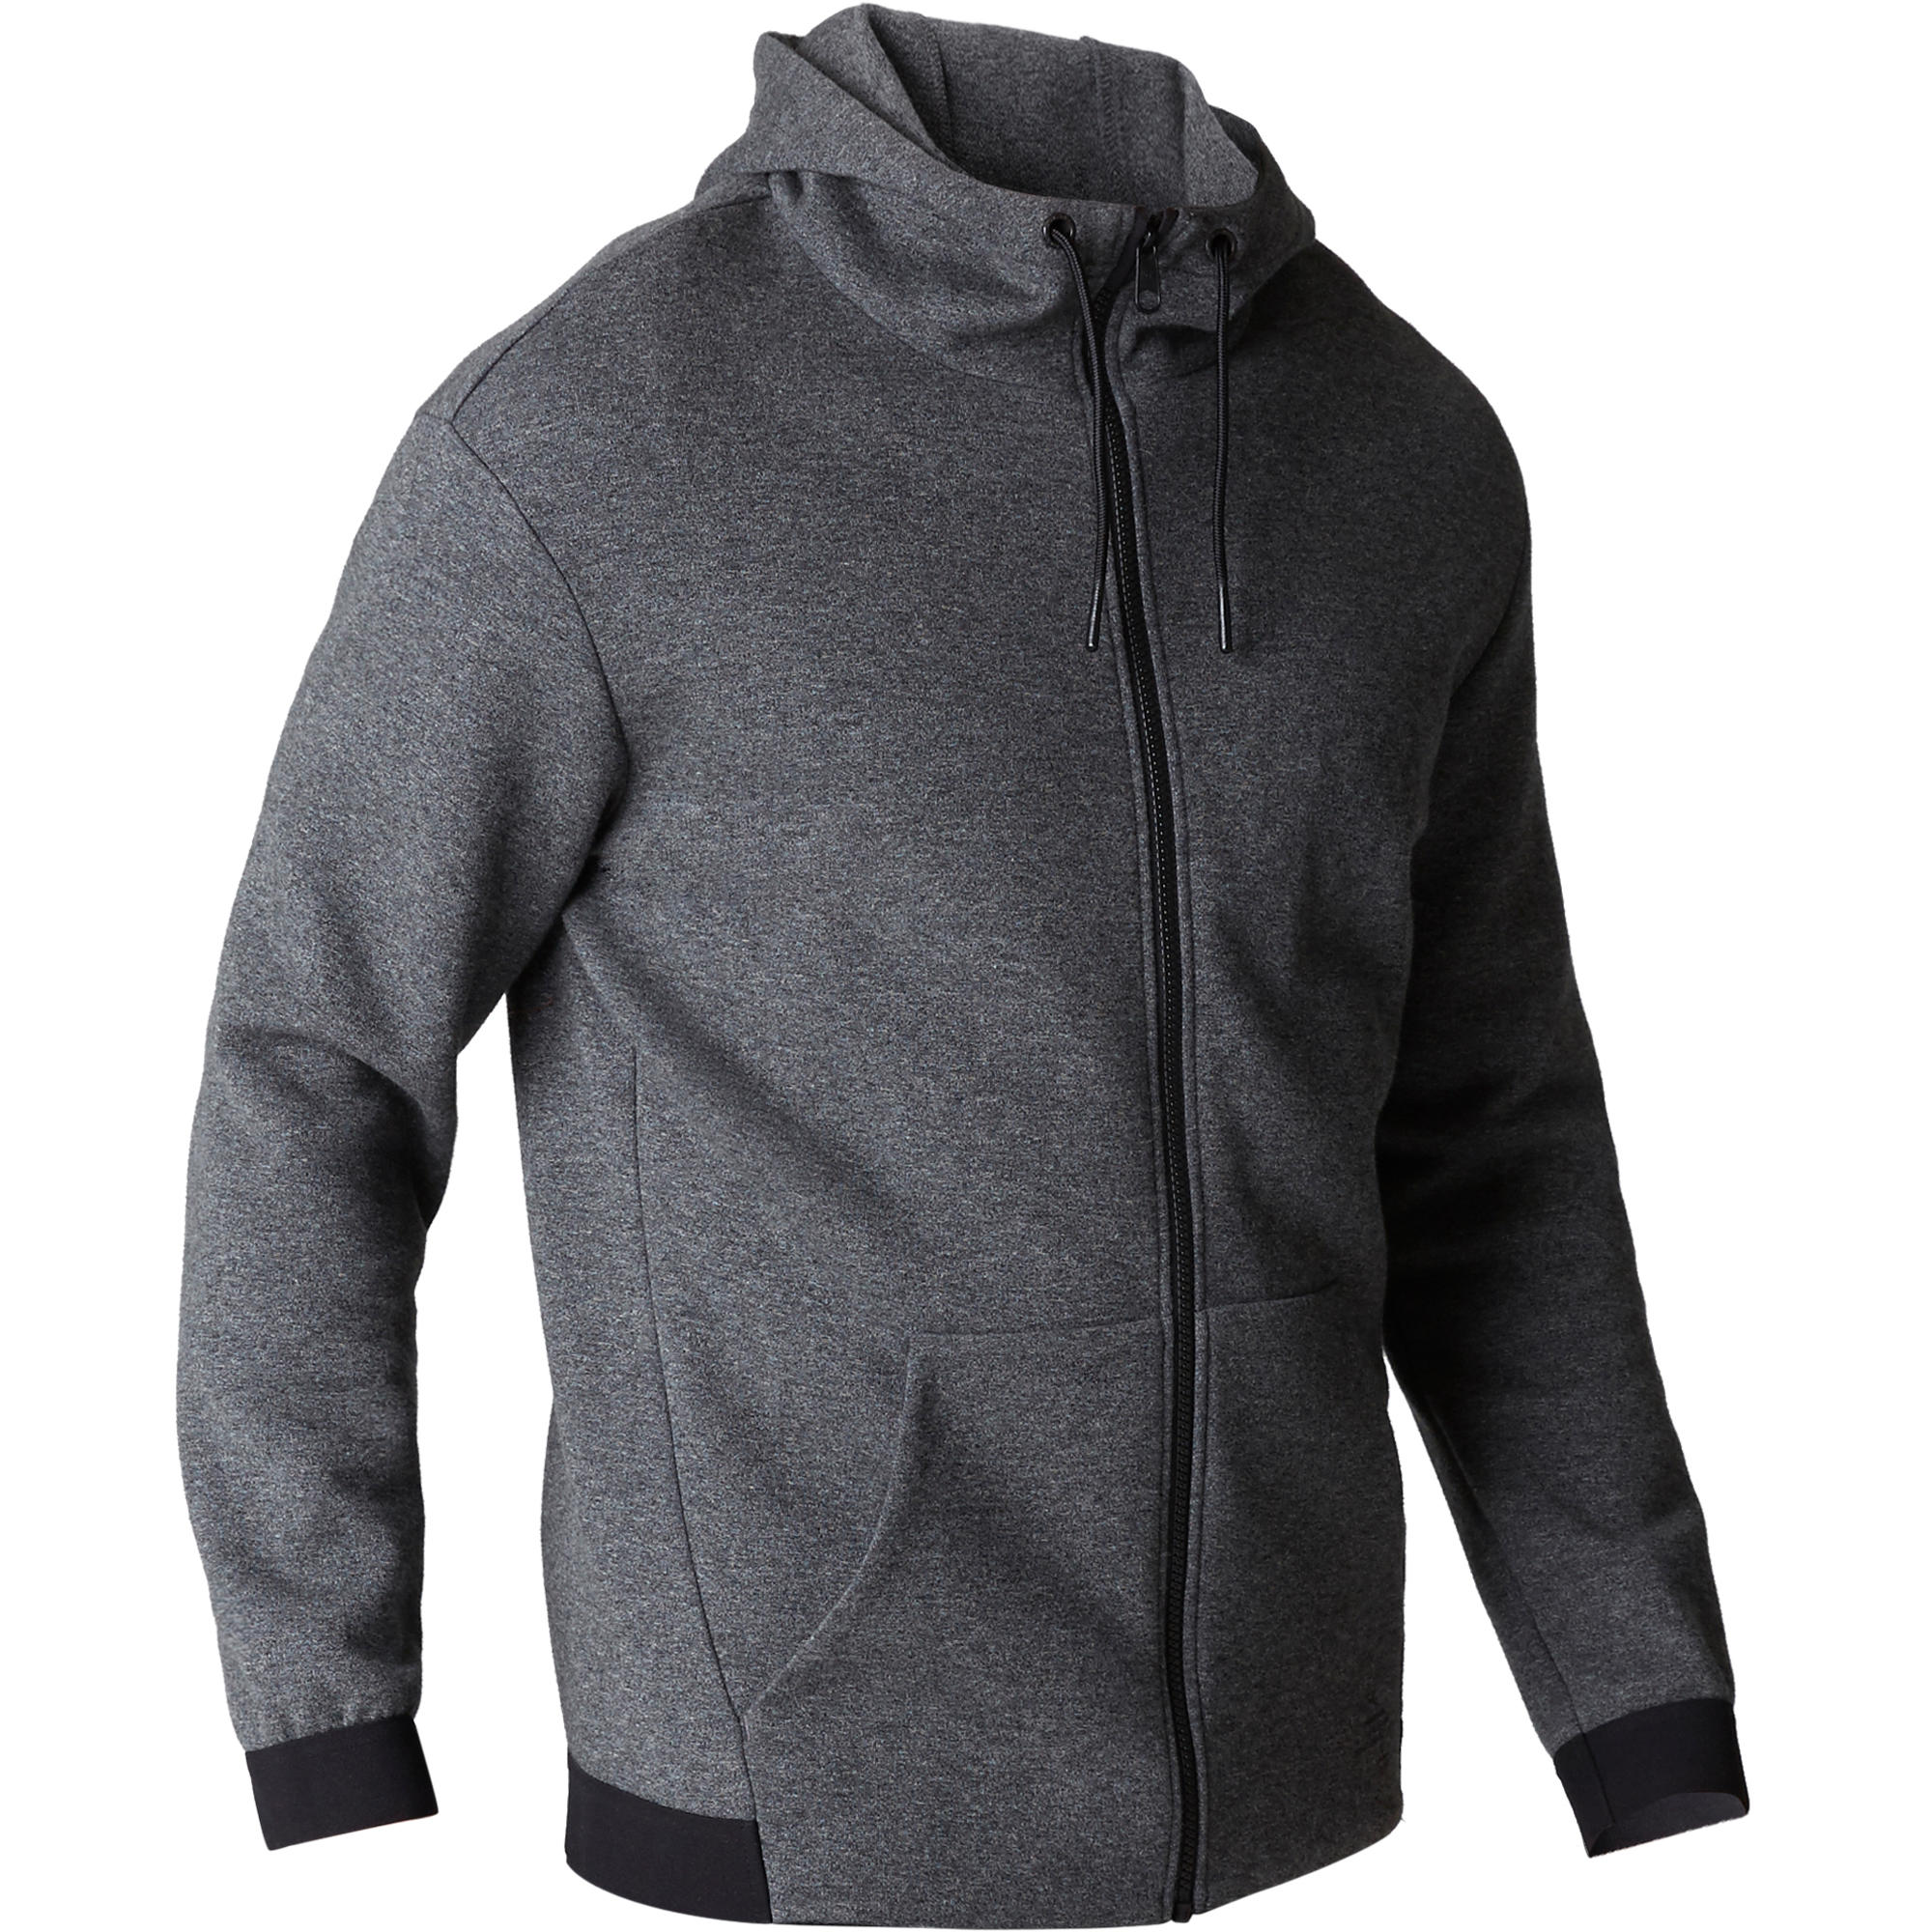 560 Gym Stretching Hooded Jacket - Dark Mottled Grey